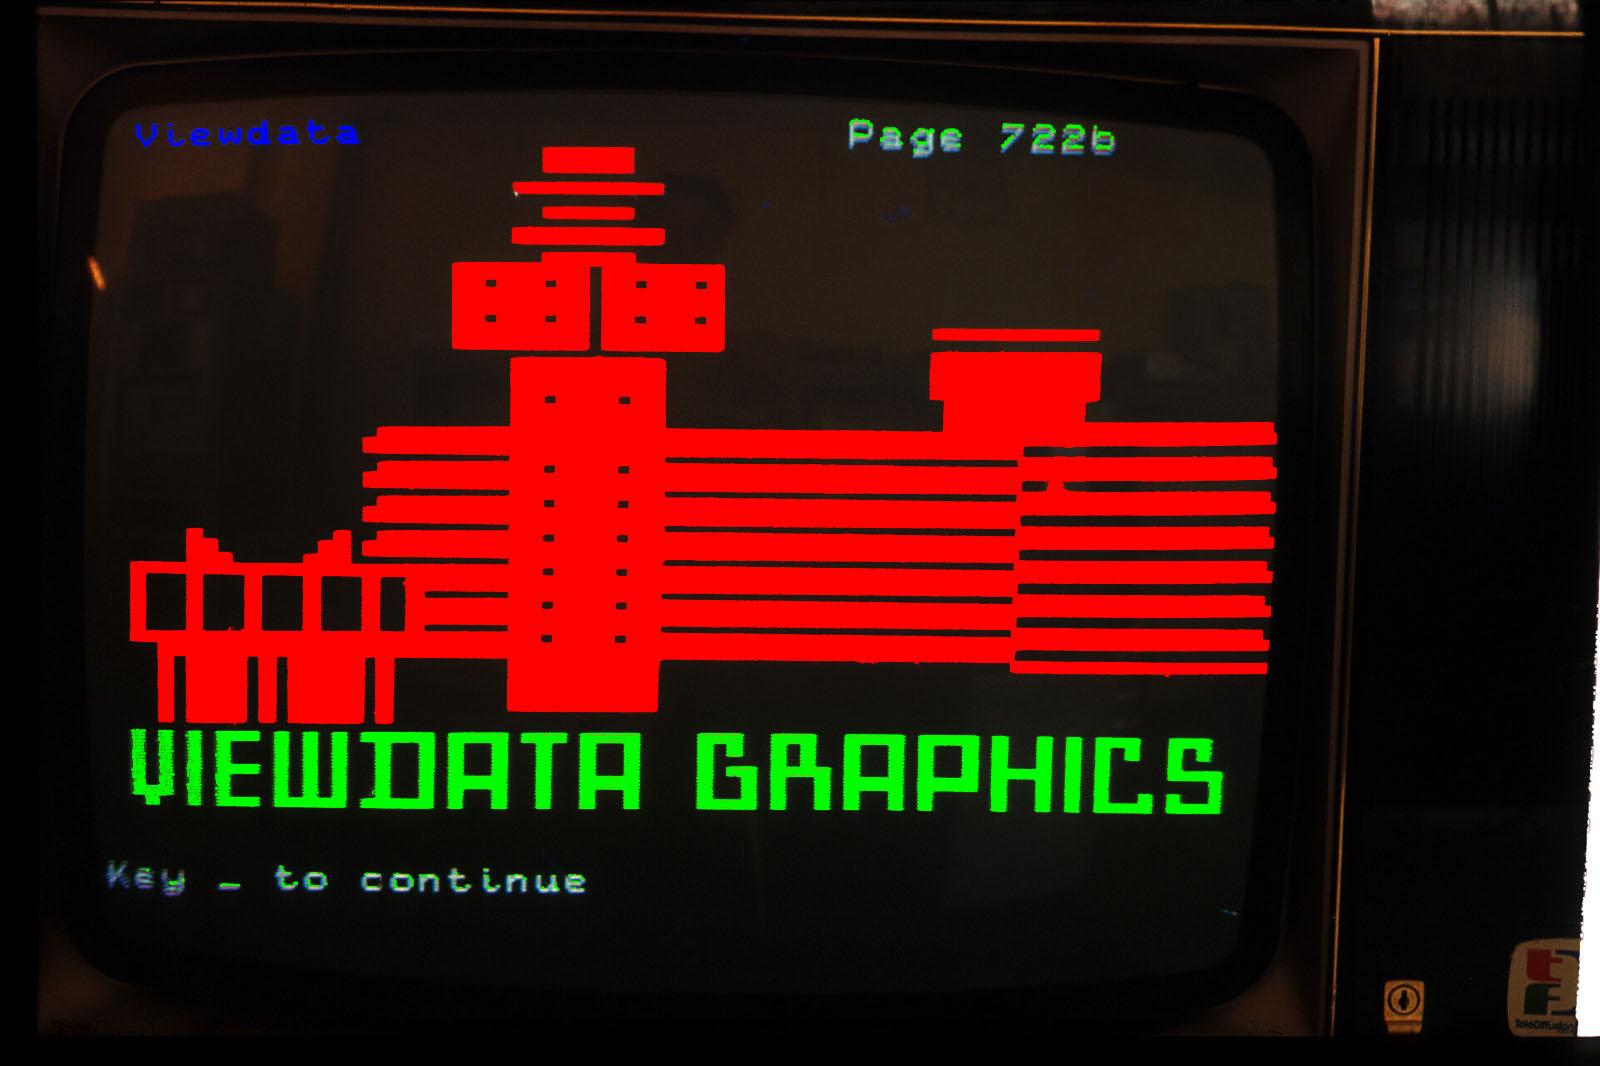 Videotex - Wikipedia